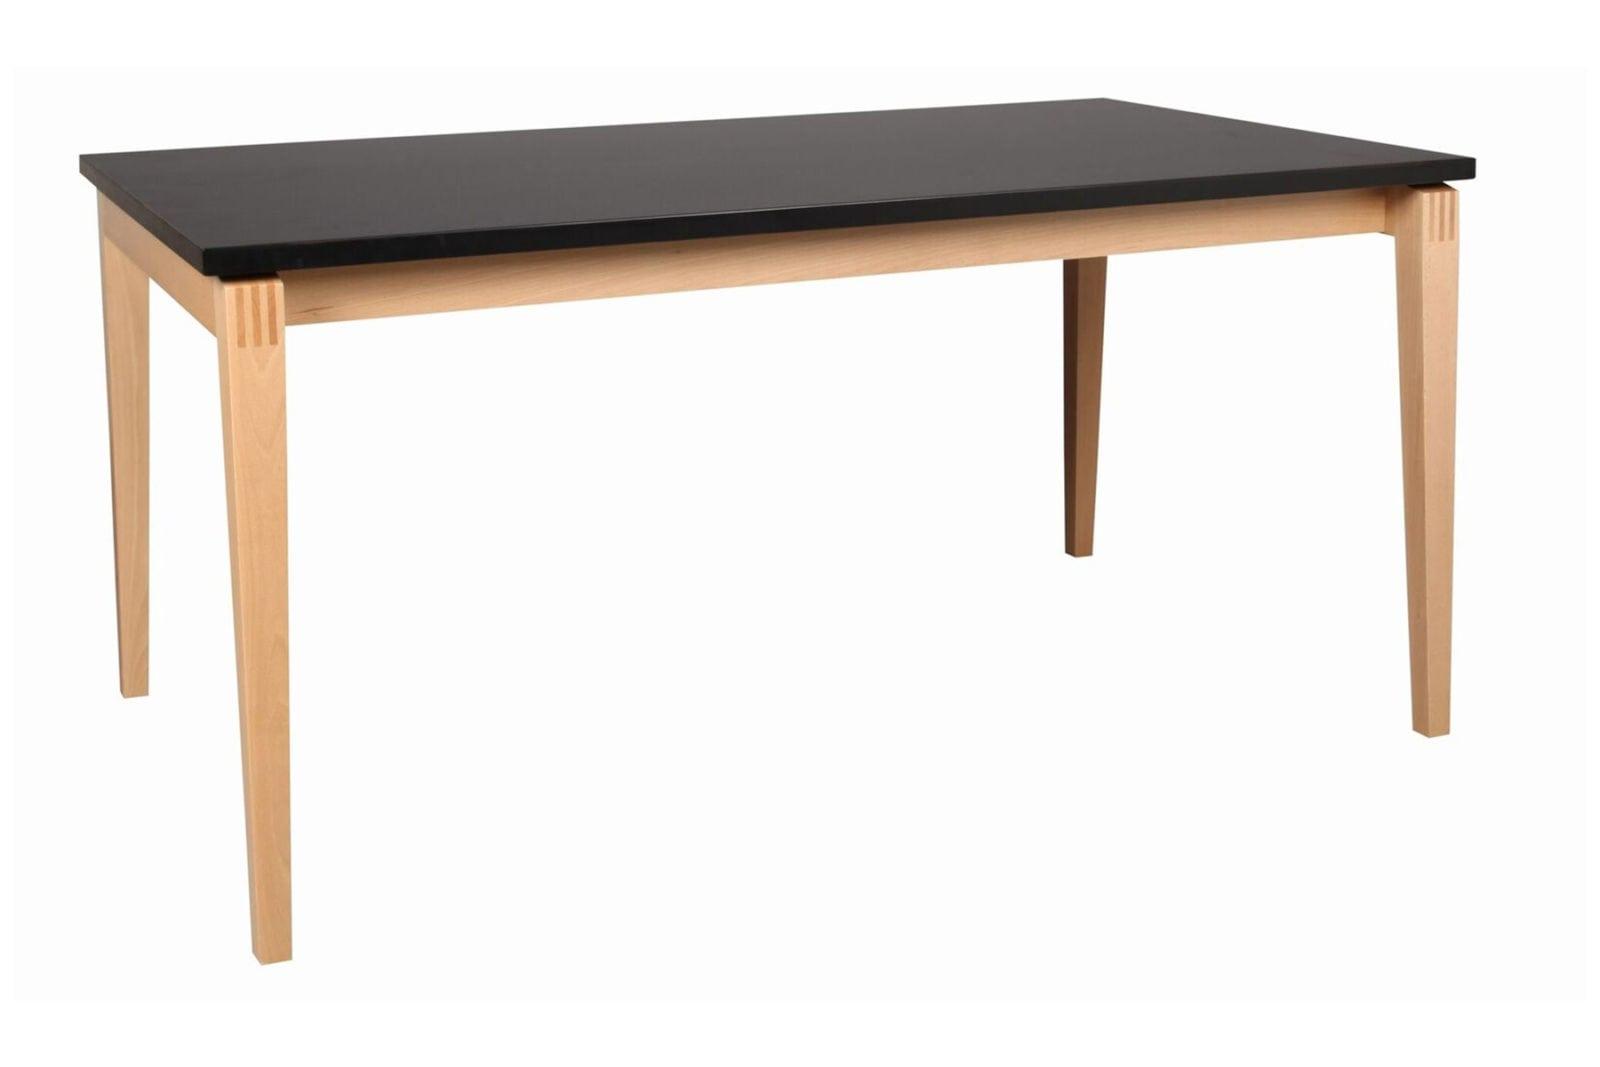 ton stockholm dining table statement id. Black Bedroom Furniture Sets. Home Design Ideas